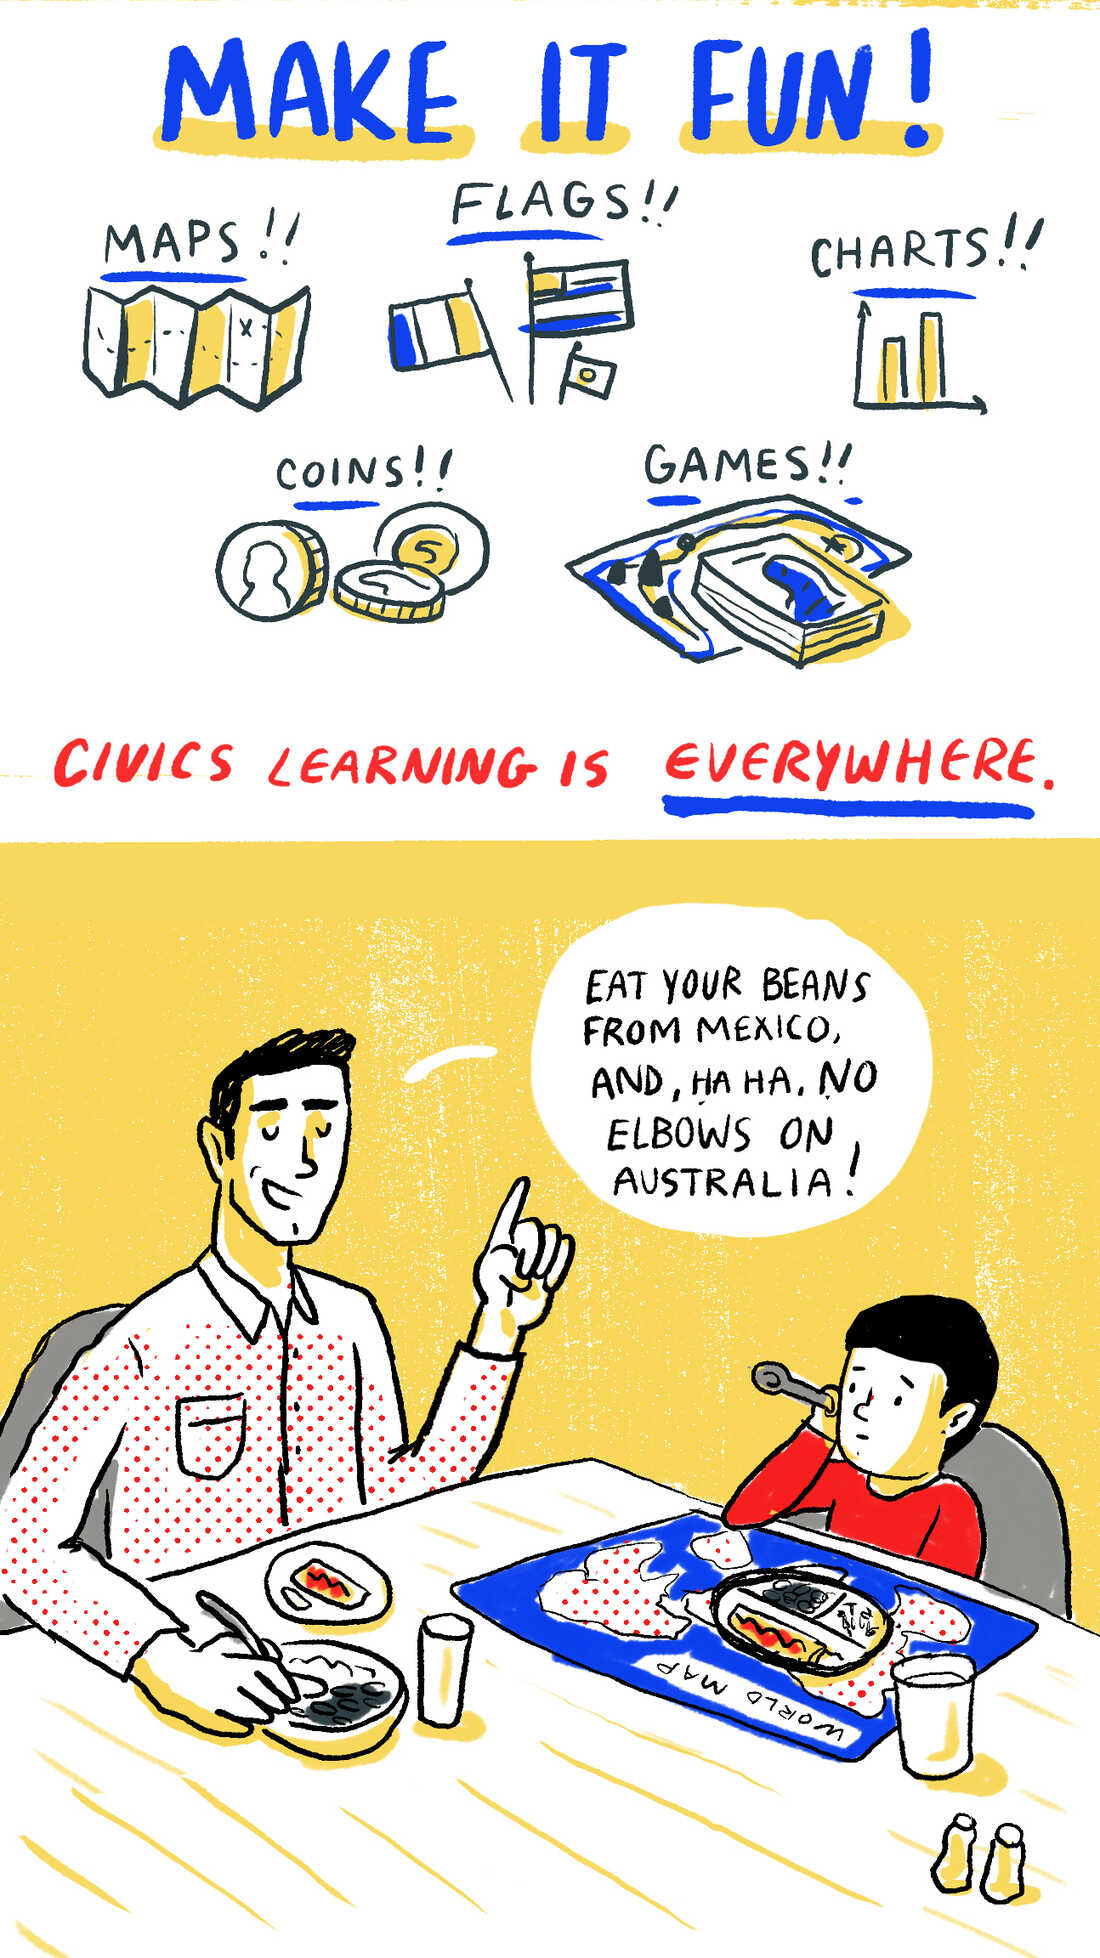 Make it fun! Civics learning is everywhere.